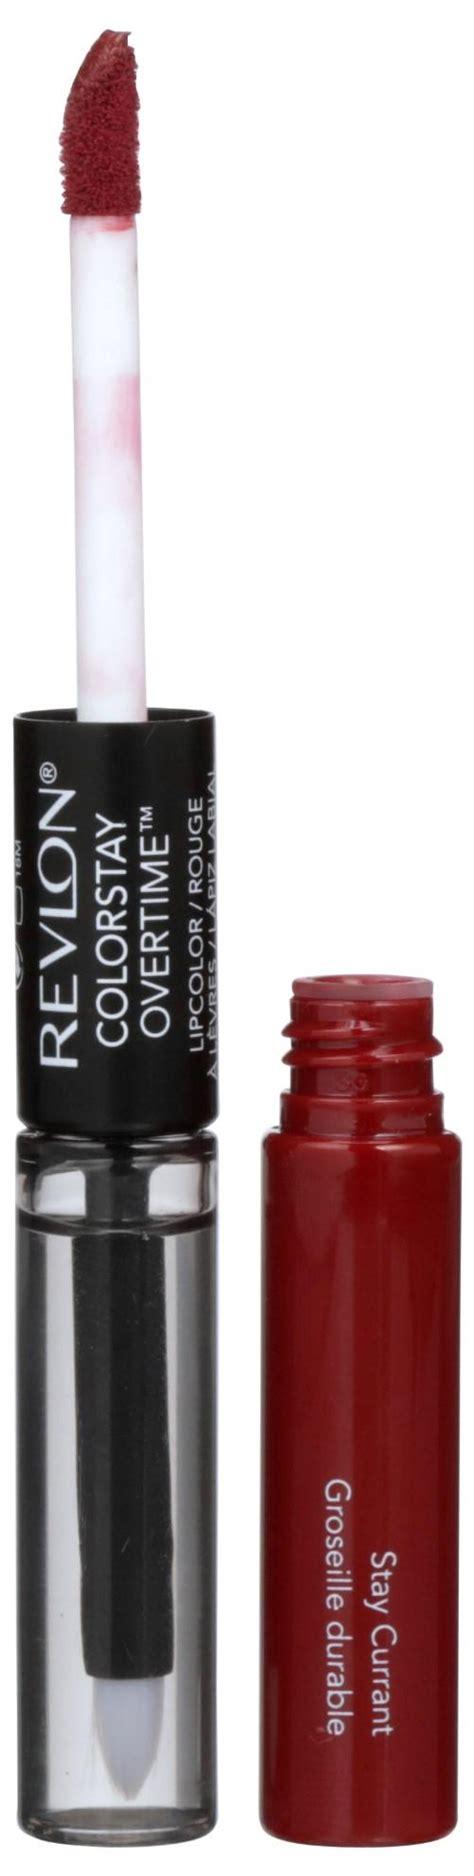 Lipstik Revlon Colorstay Overtime revlon colorstay overtime lipcolor stay currant lipstick